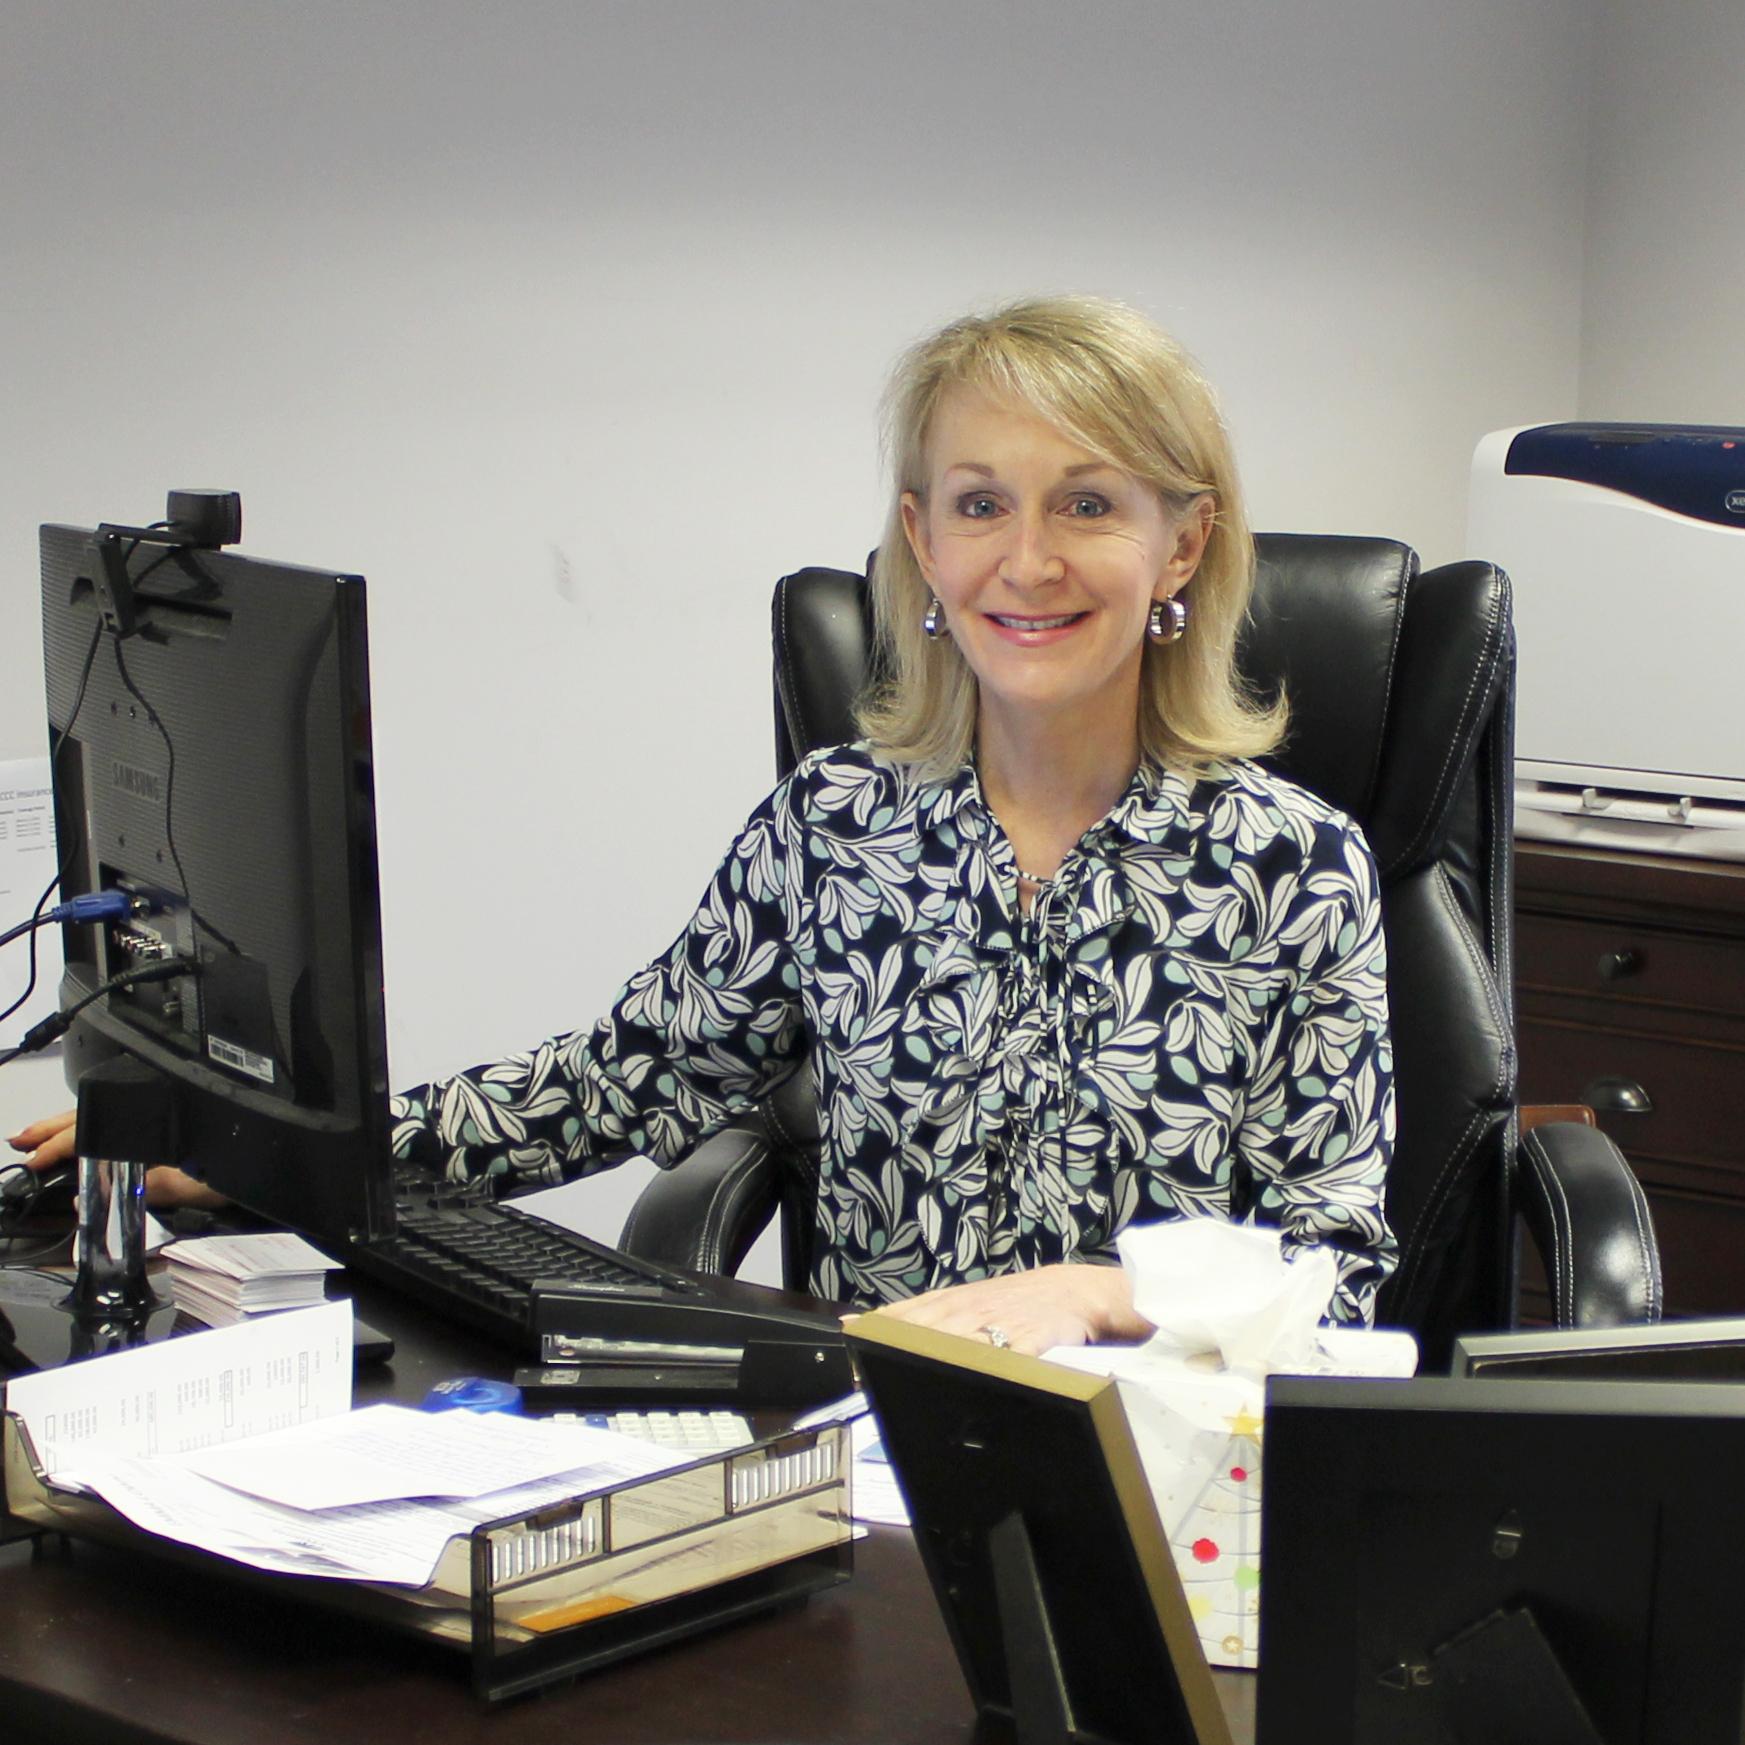 Gail Rittenhouse